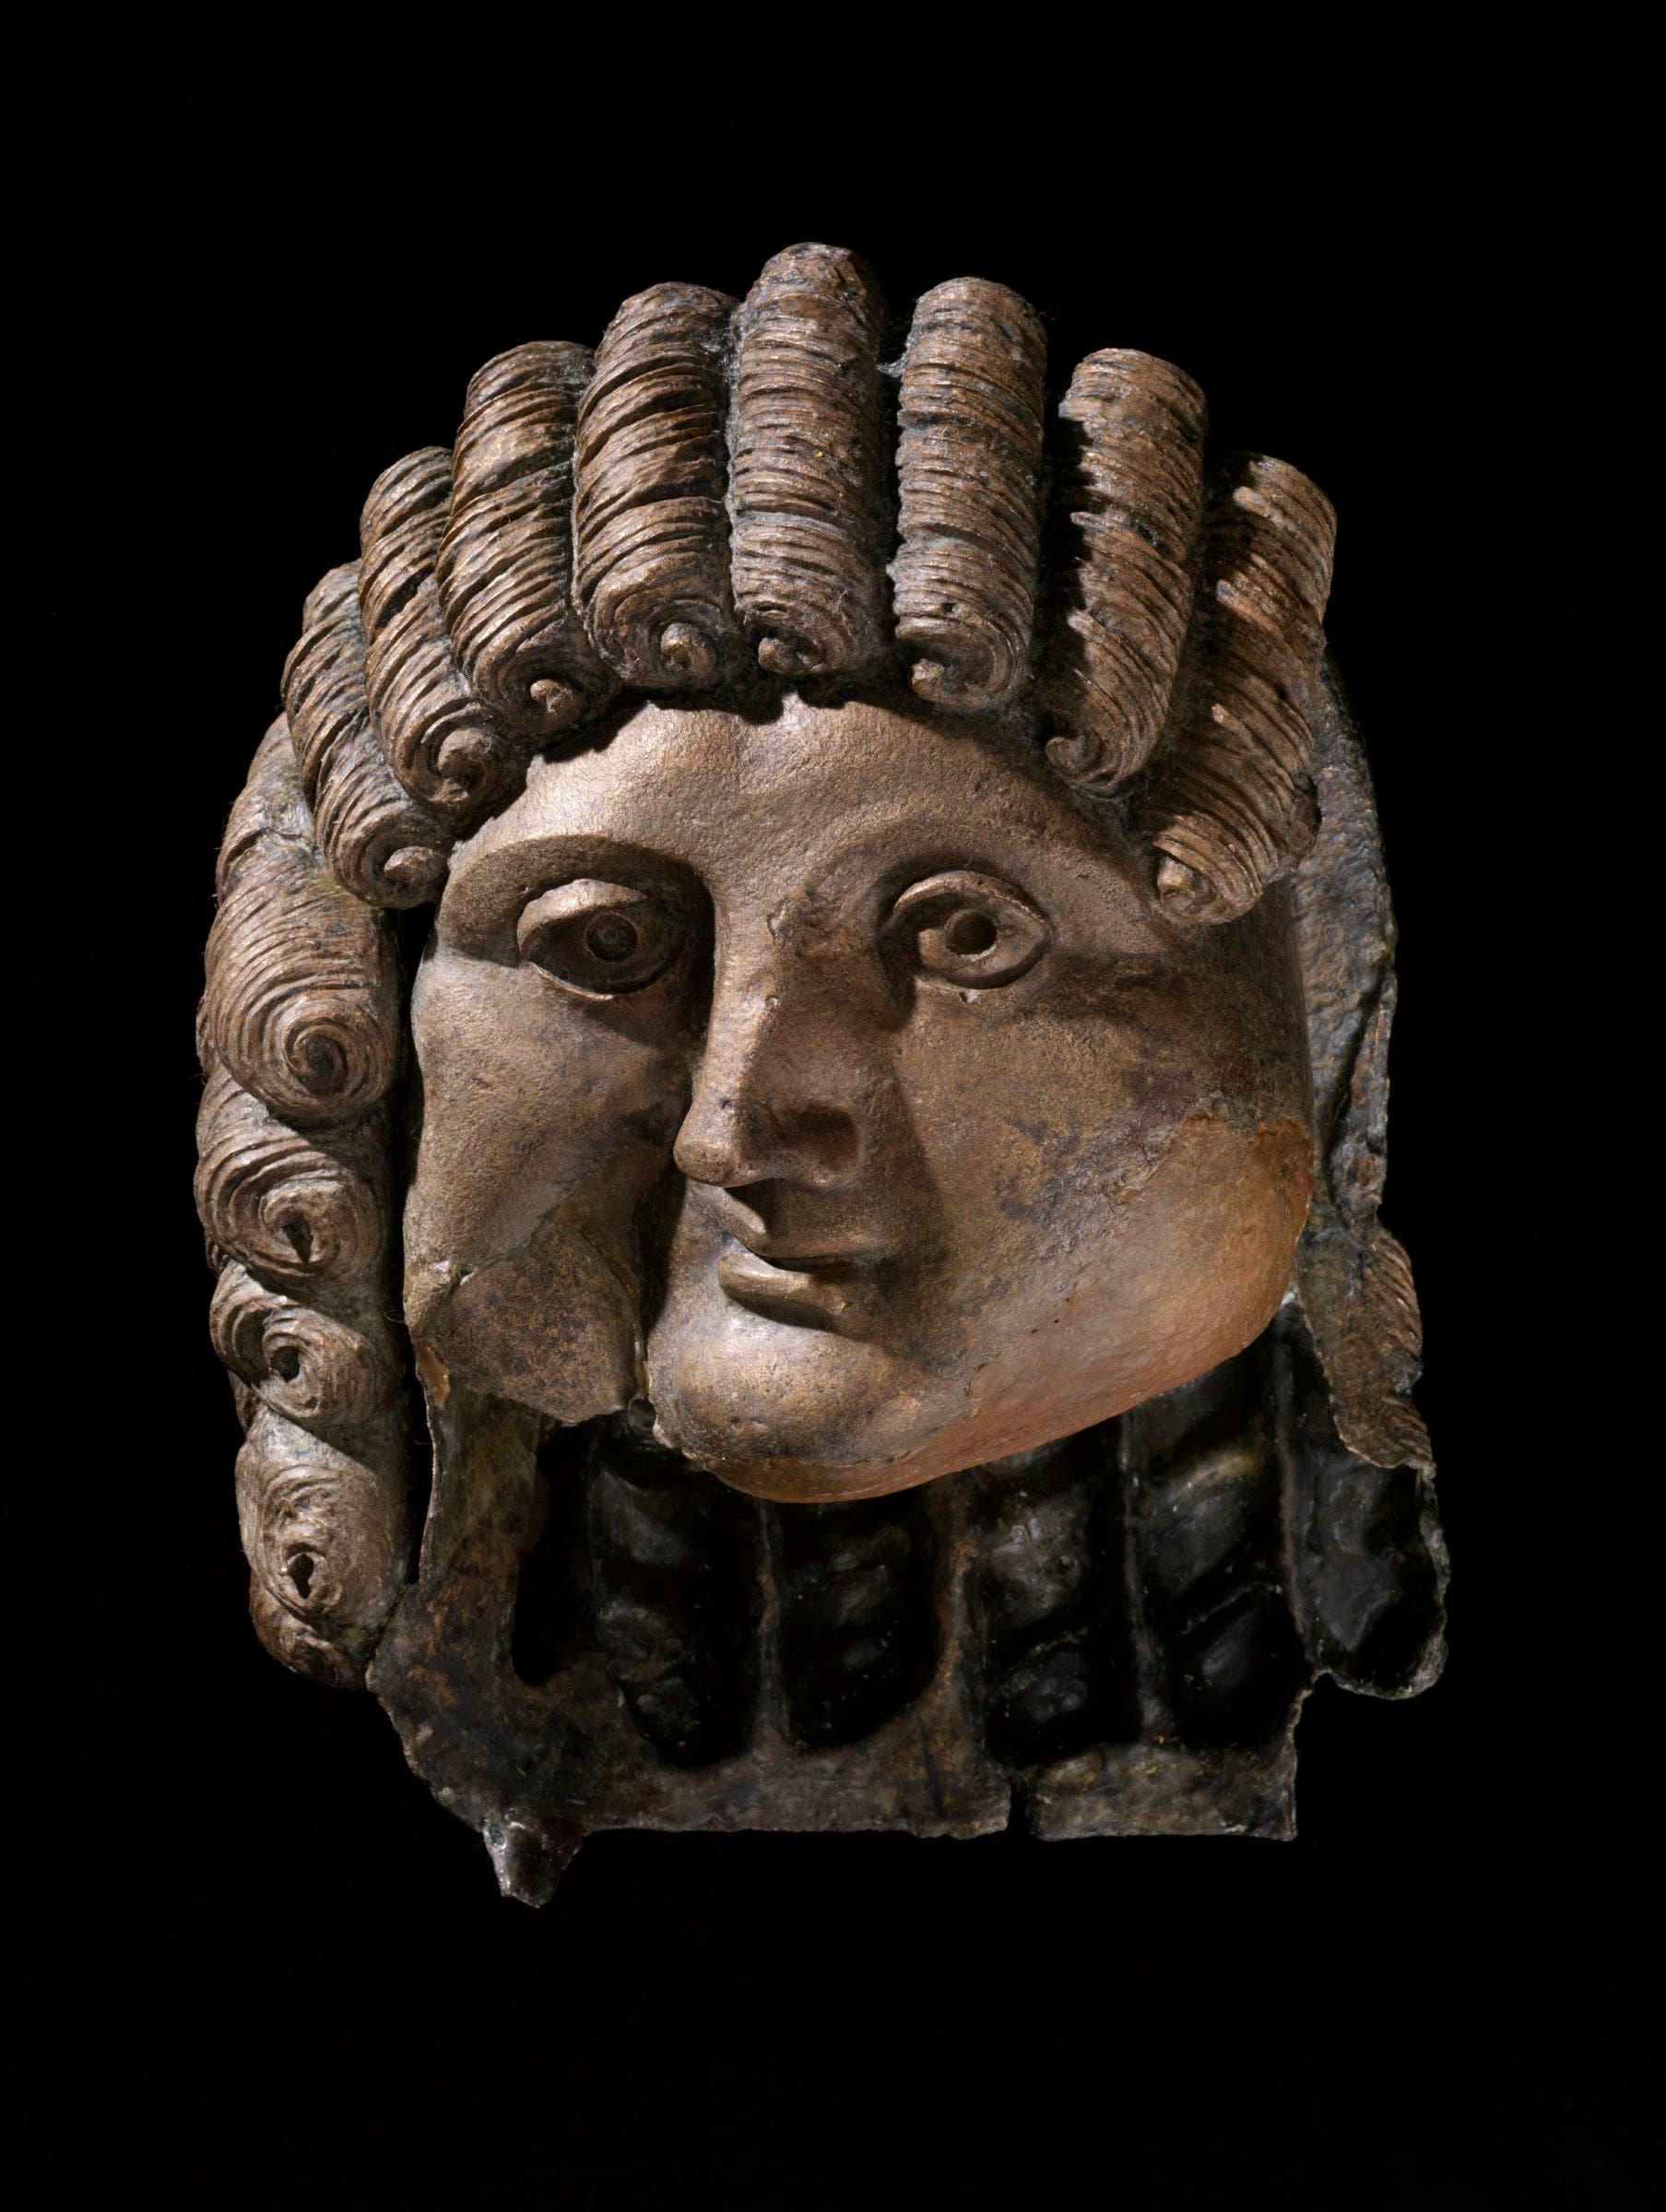 Head of a Man, Qaryat al-Faw, Saudi Arabia, 1st century BCu20132nd century AD, cast bronze, Department of Archaeology Museum, King Saud University, Riyadh